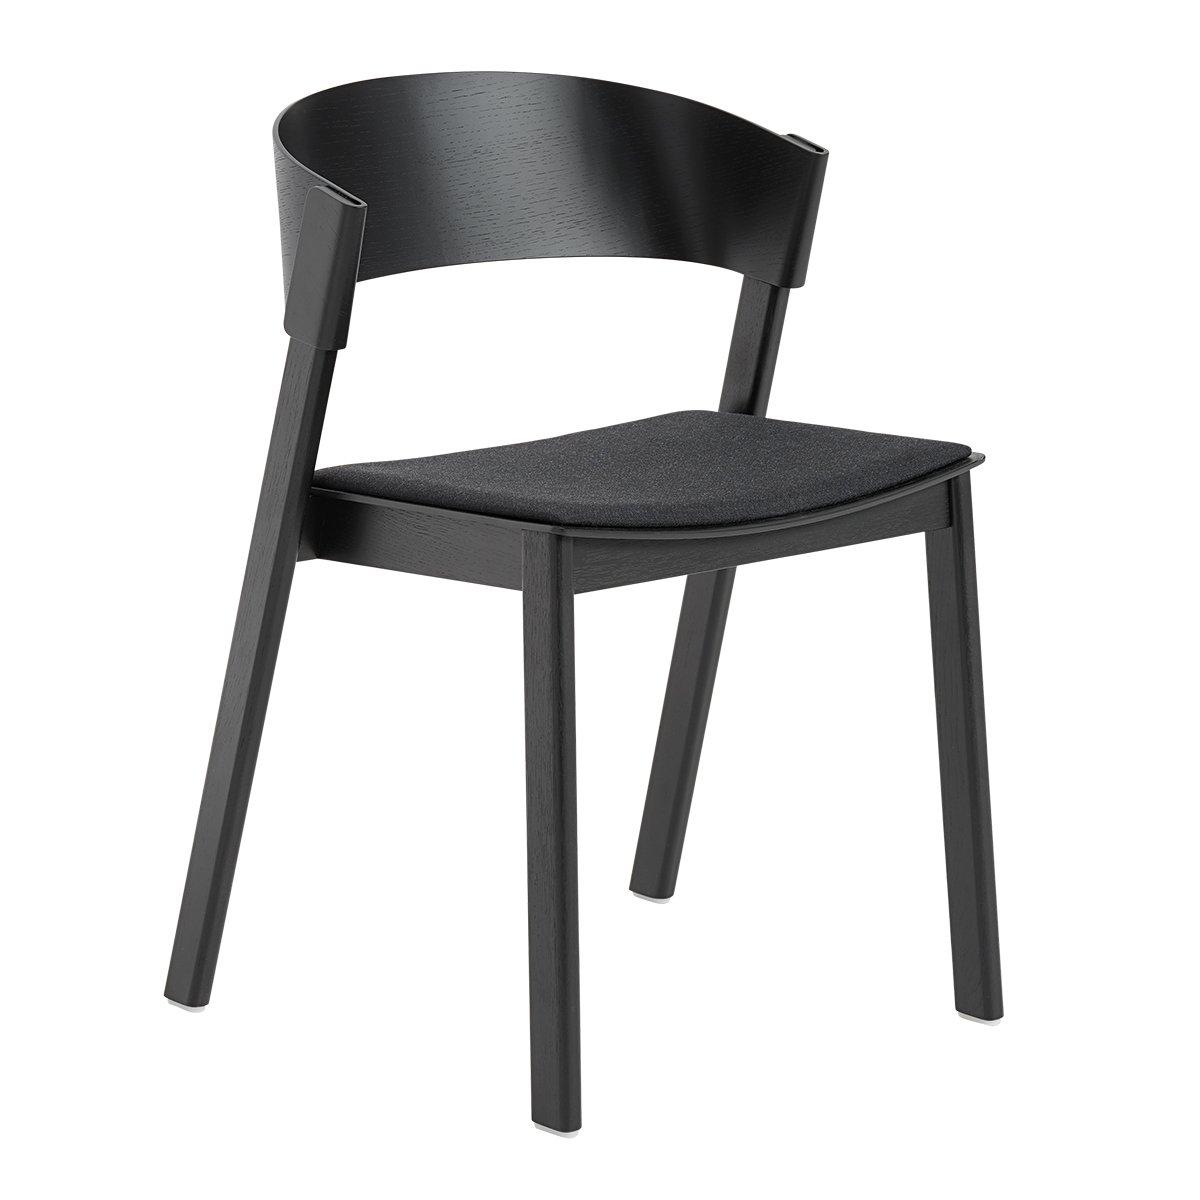 Muuto Cover Side Chair - Zwart - Remix 183 Stoffering